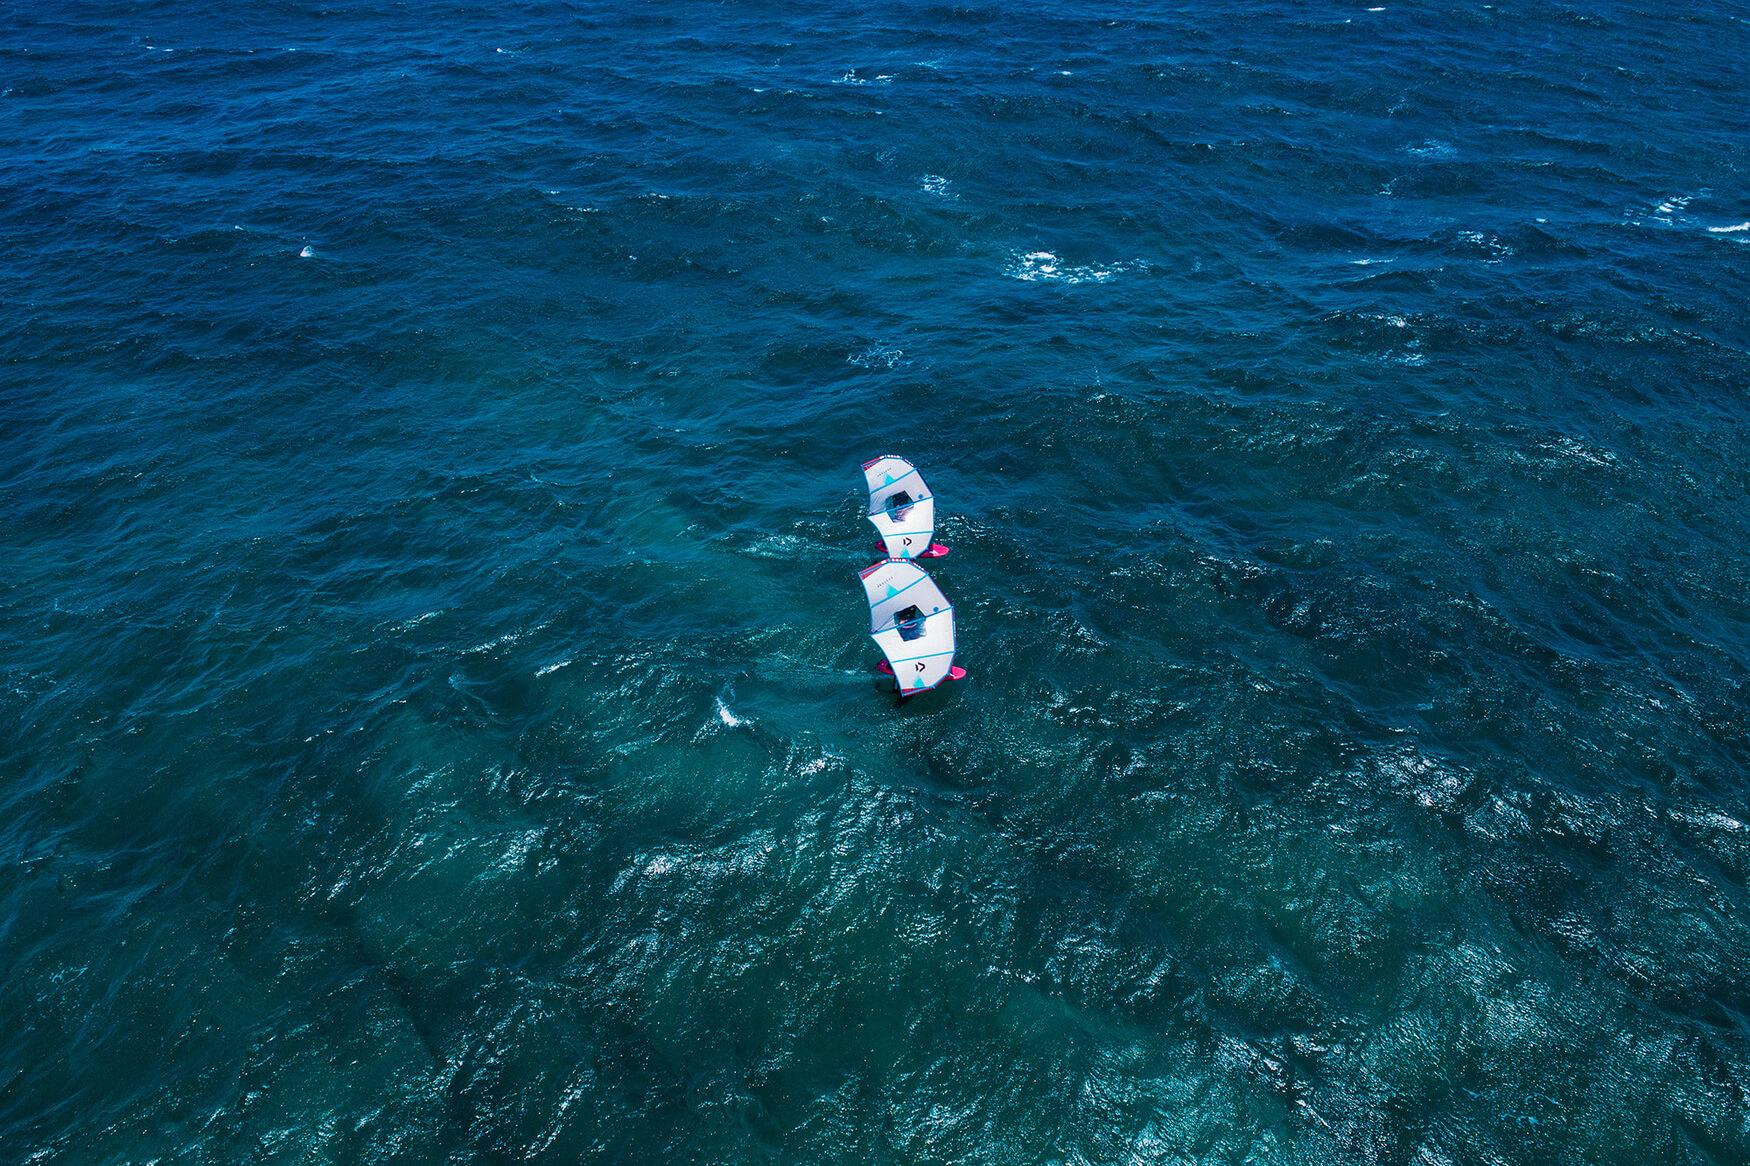 Klaas Sky SkySUP Wing DJI 0119-Maui2019-Fanatic-Duotone-marcusfriedrich.media